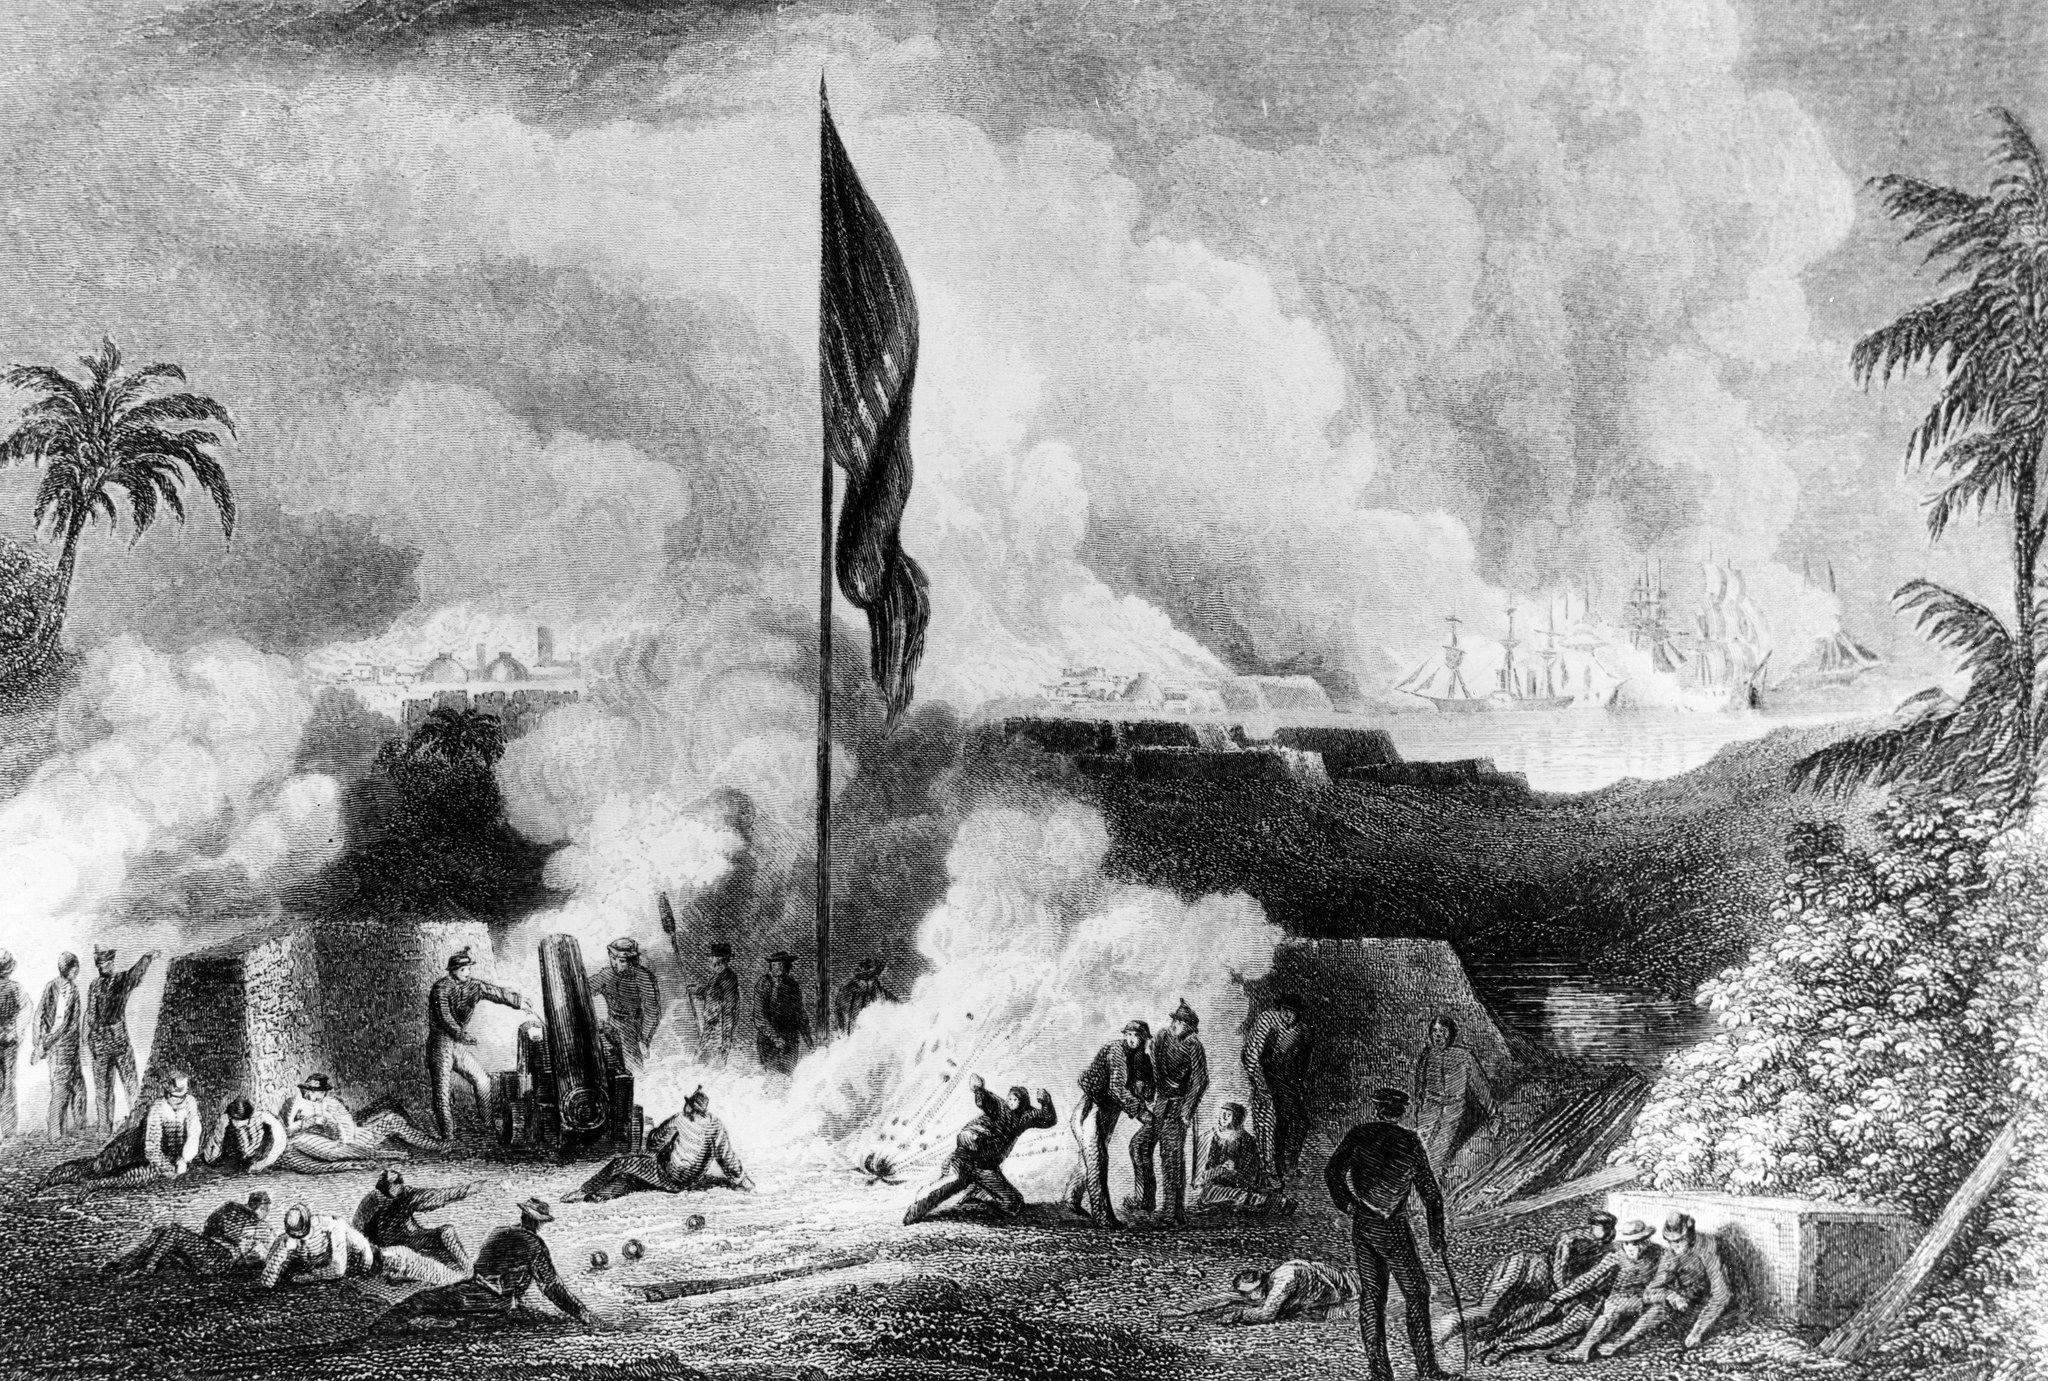 The Siege of Veracruz